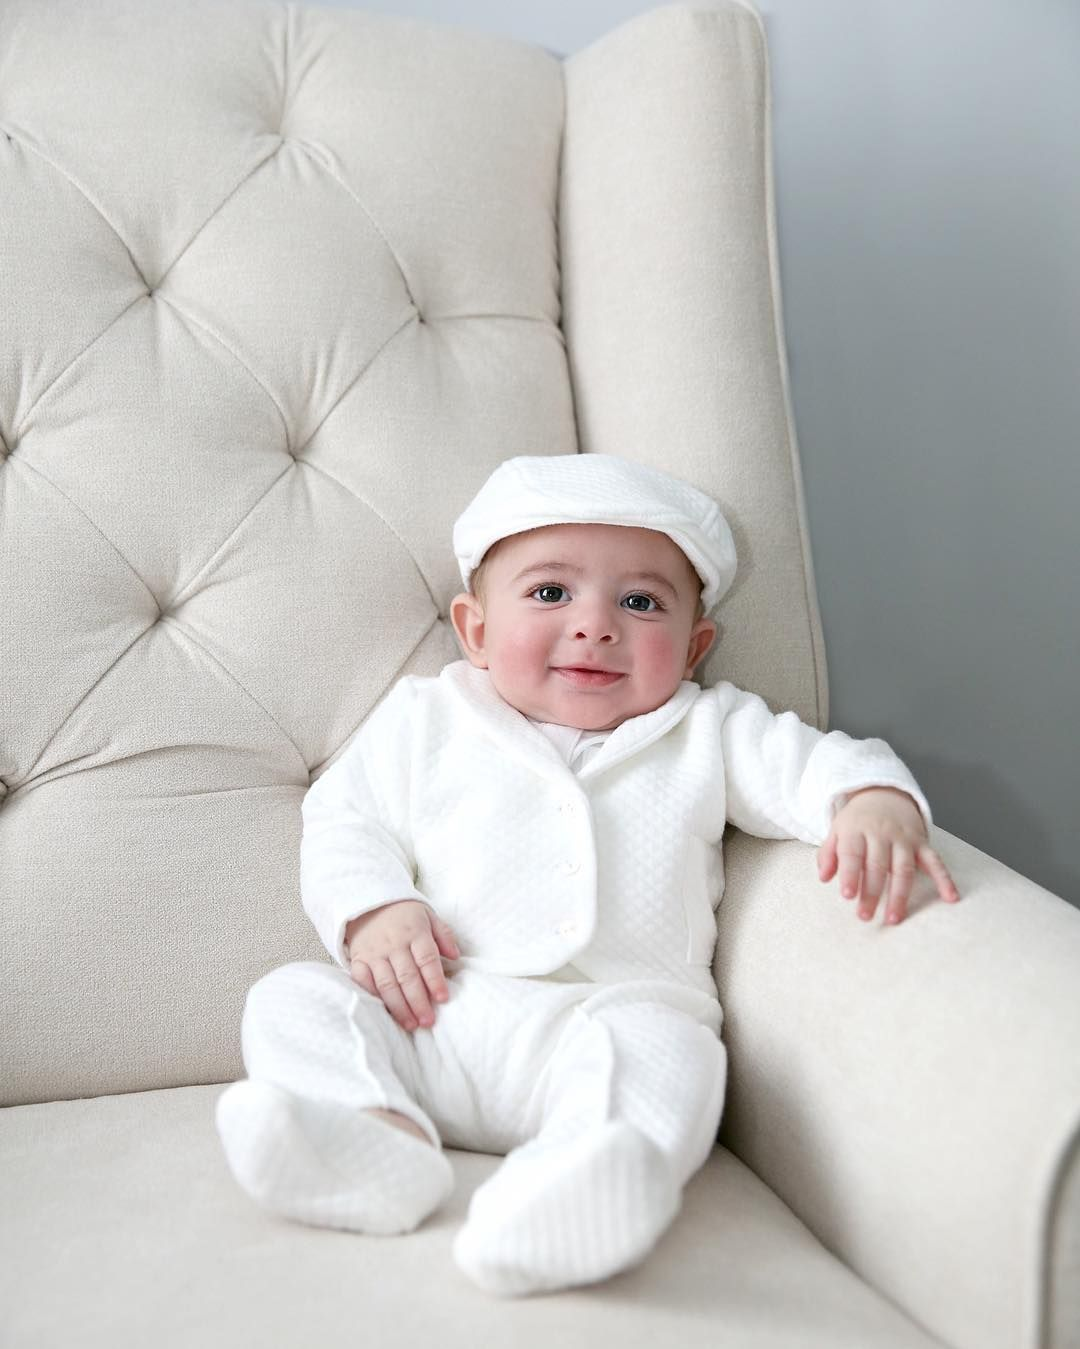 f53f90ffe2cc2 anthonysamona_quikpix My baby boy Adam on his baptism day ...